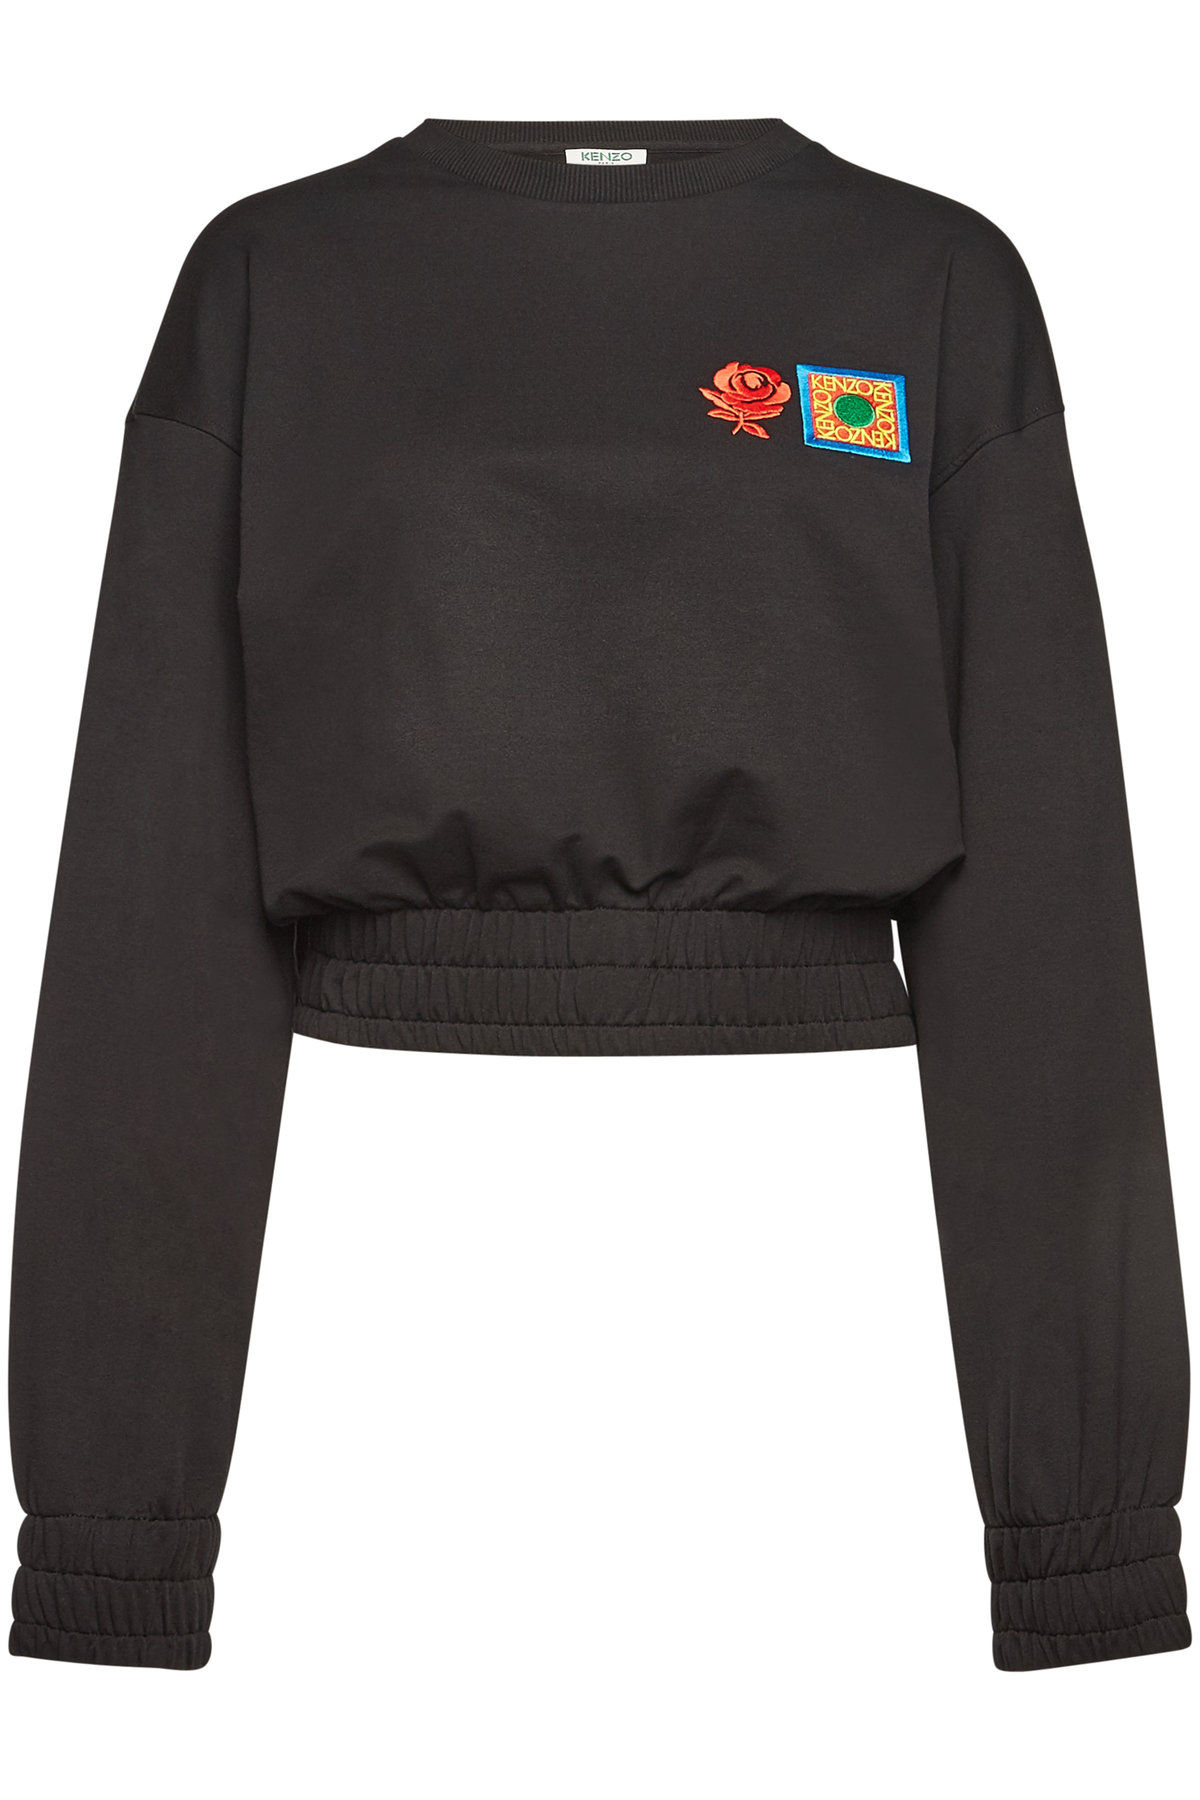 Kenzo Embroidered Cotton Sweatshirt In Black